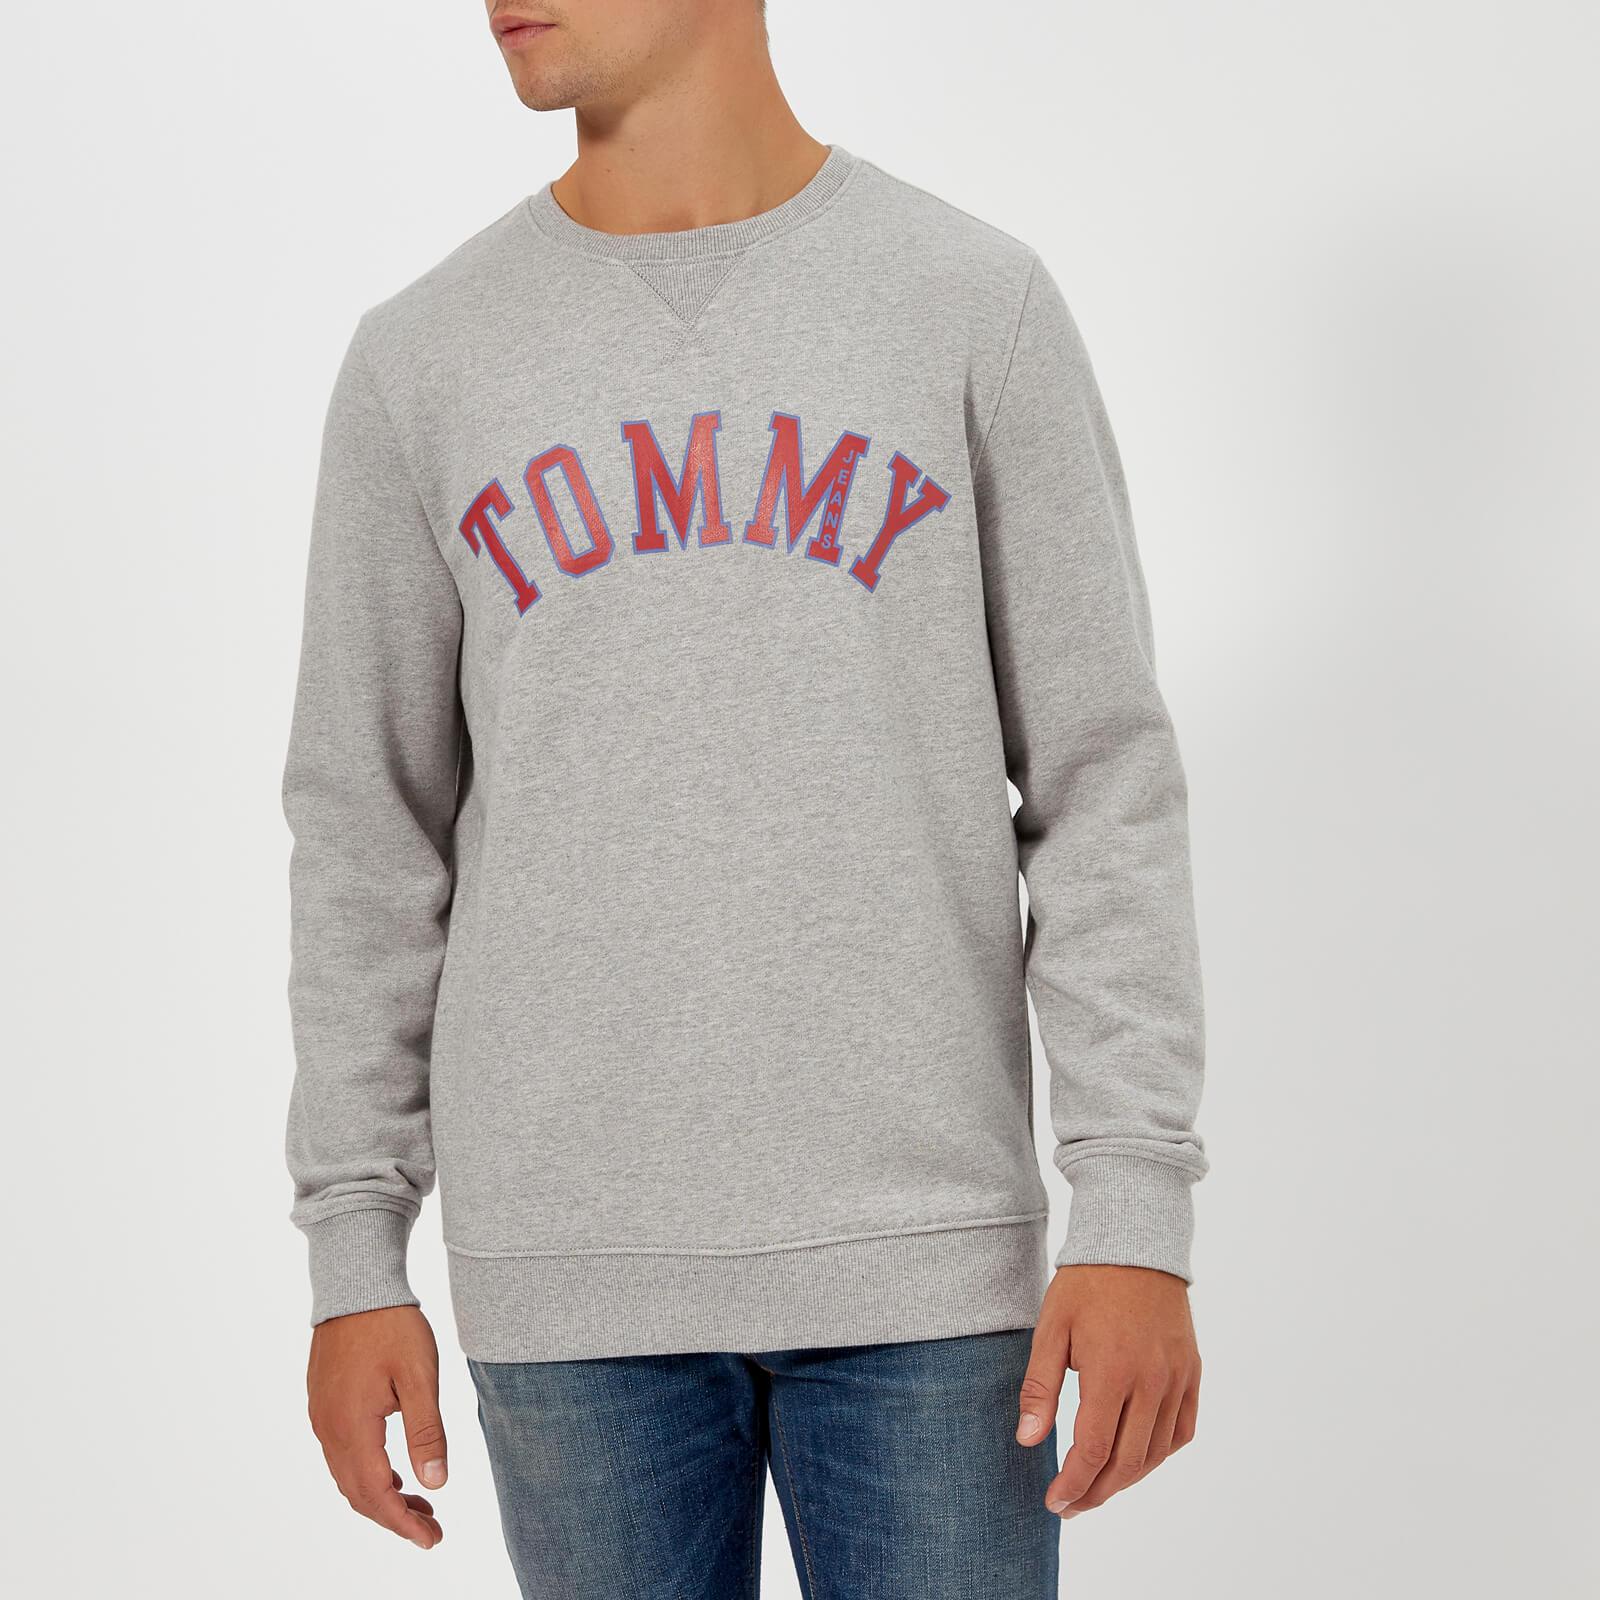 6f9564a9 ... Tommy Jeans Men's TJM Essential Graphic Sweatshirt - Light Grey Heather